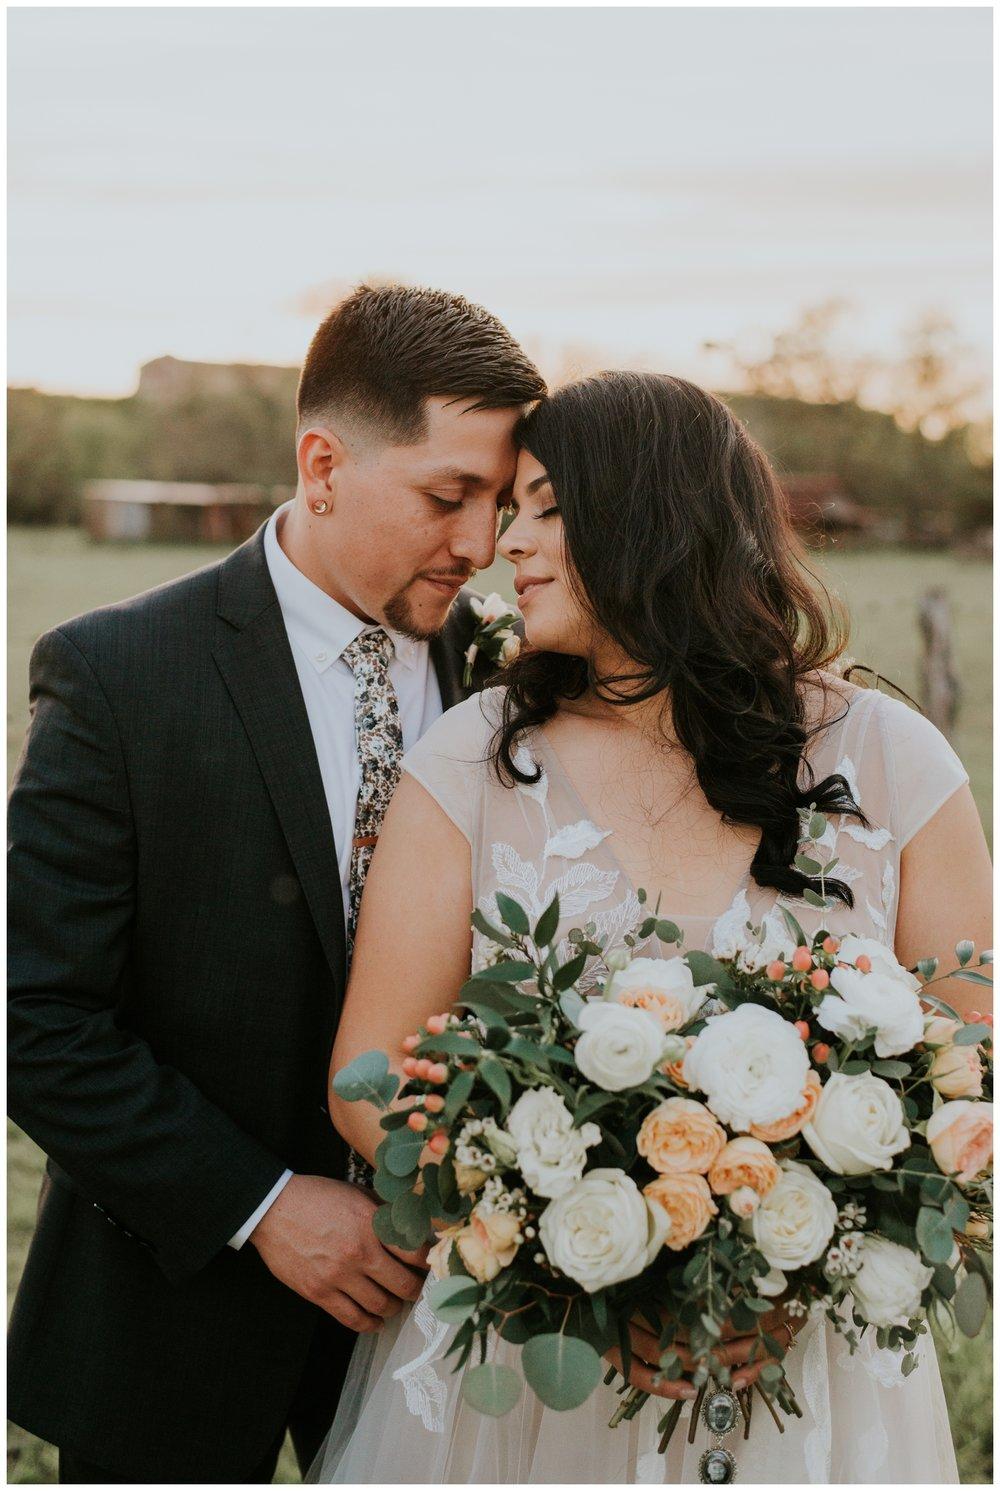 Sarah+Michael, Gruene Estate Wedding, San Antonio, Contista Productions Wedding Photography_0069.jpg